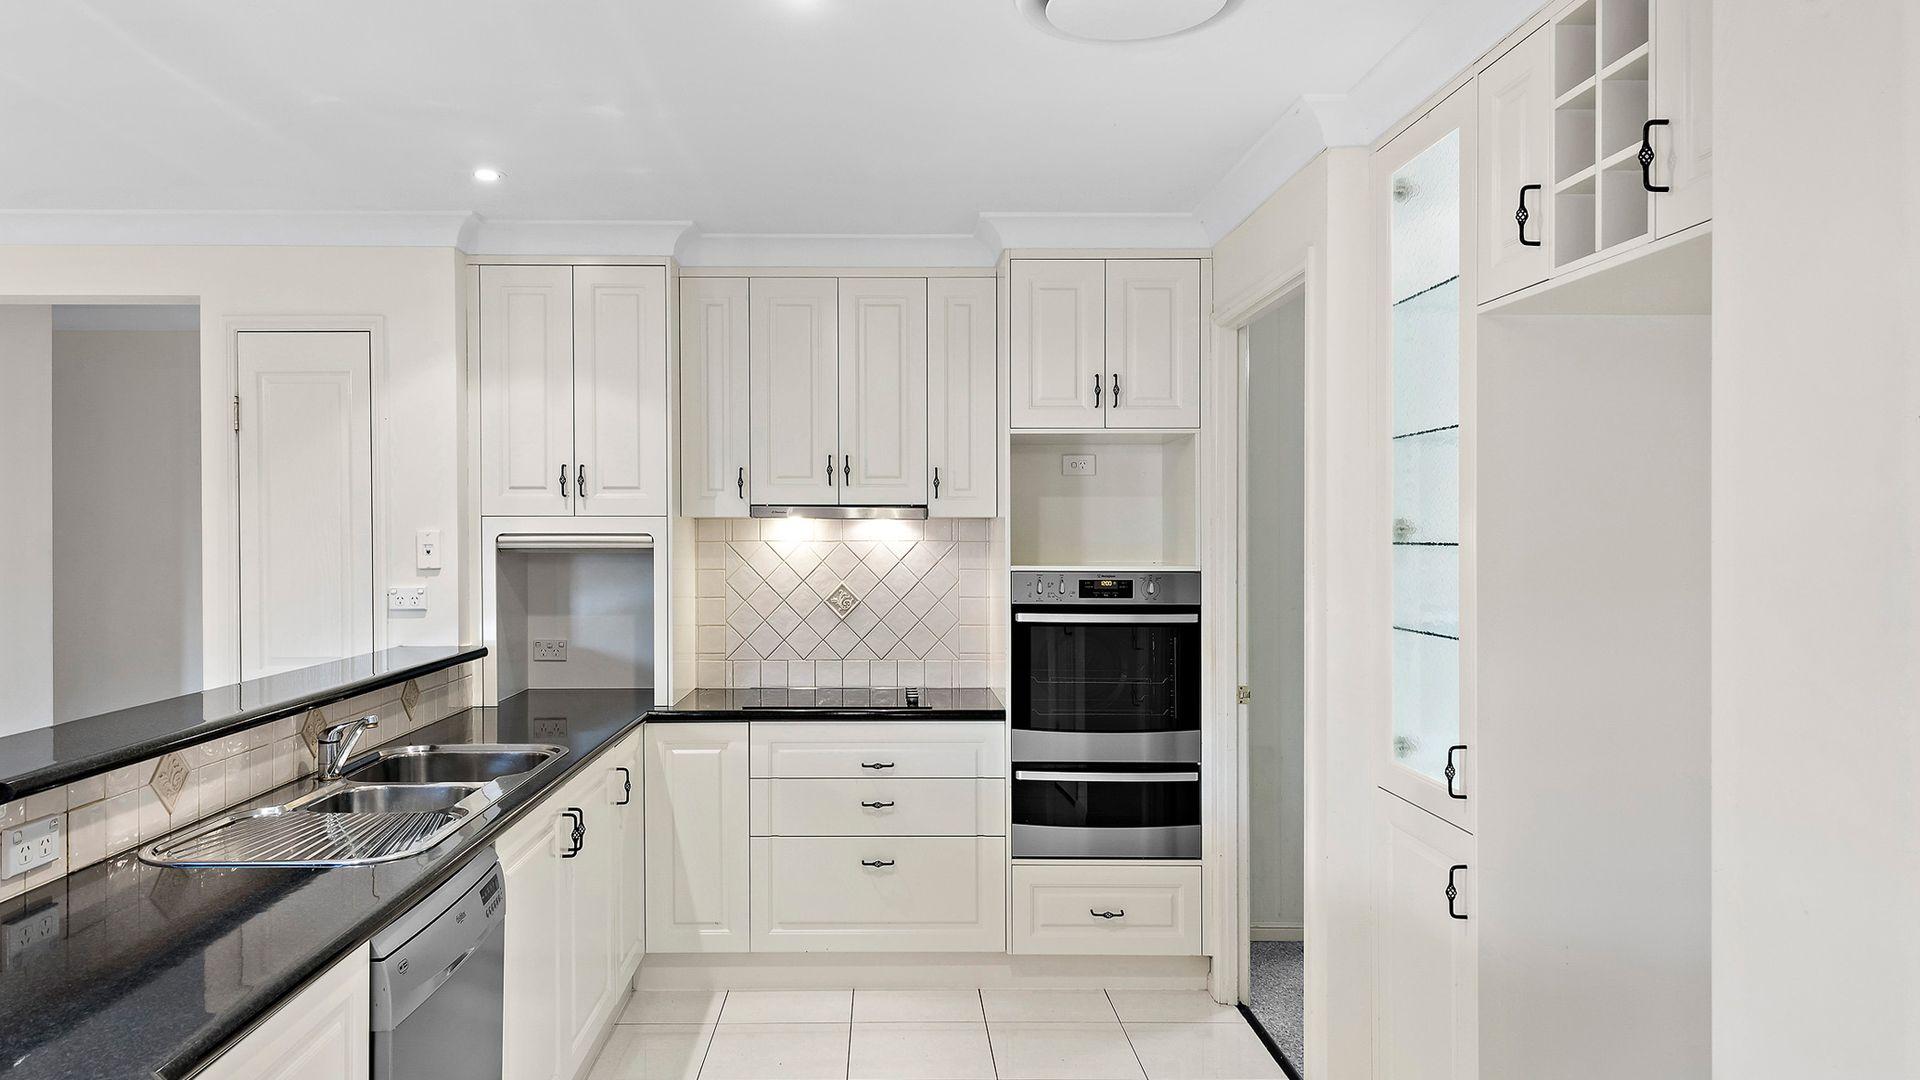 28 Trevean Drive, Kleinton QLD 4352, Image 1